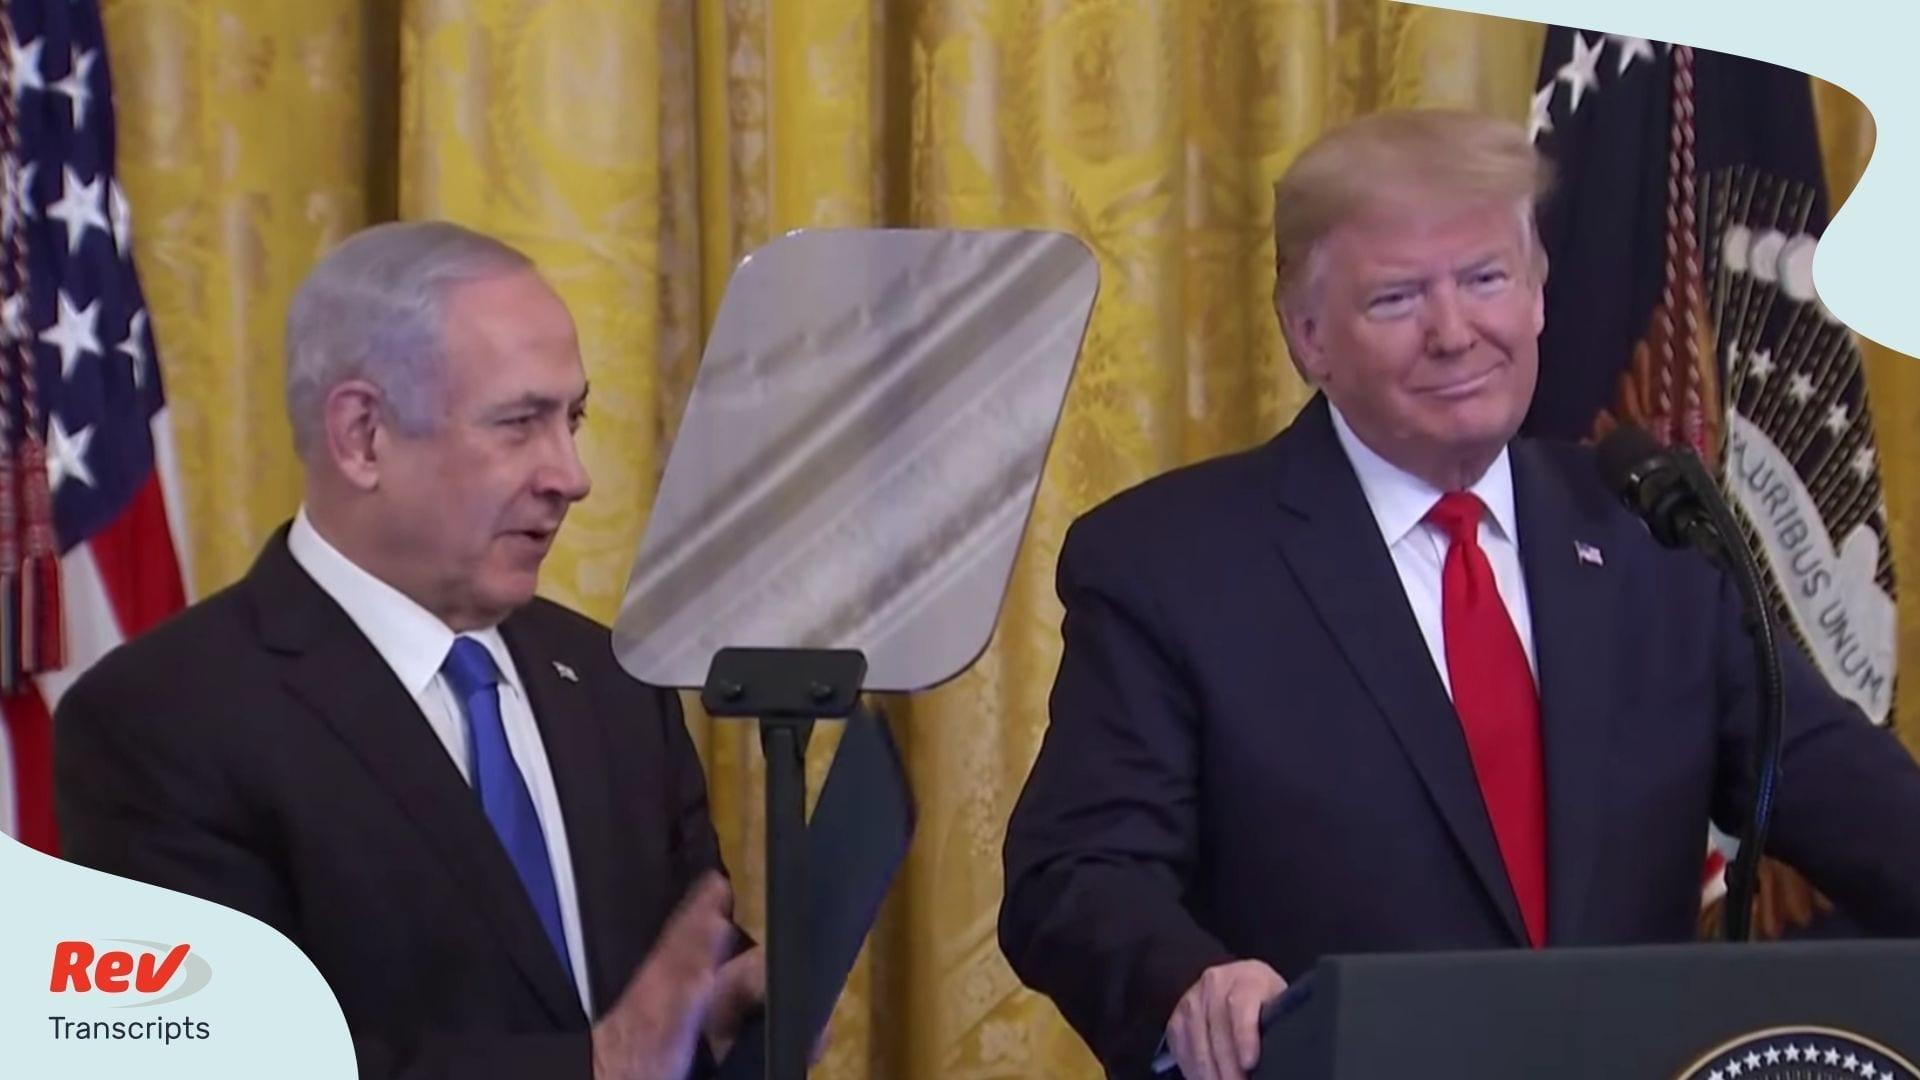 Donald Trump Middle East Peace Plan Speech Netanyahu